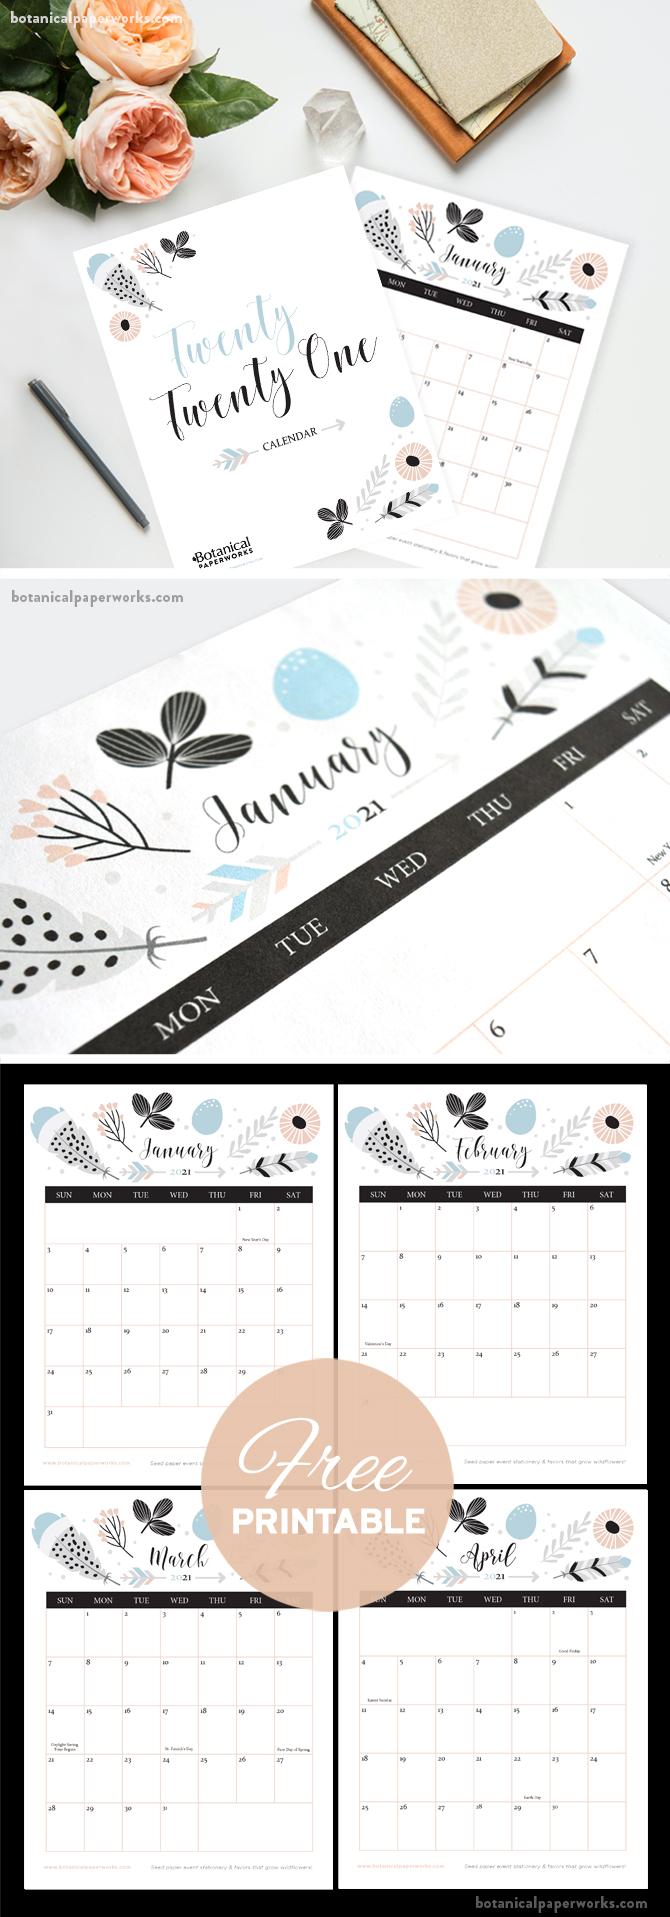 free printable boho style calendar for 2021